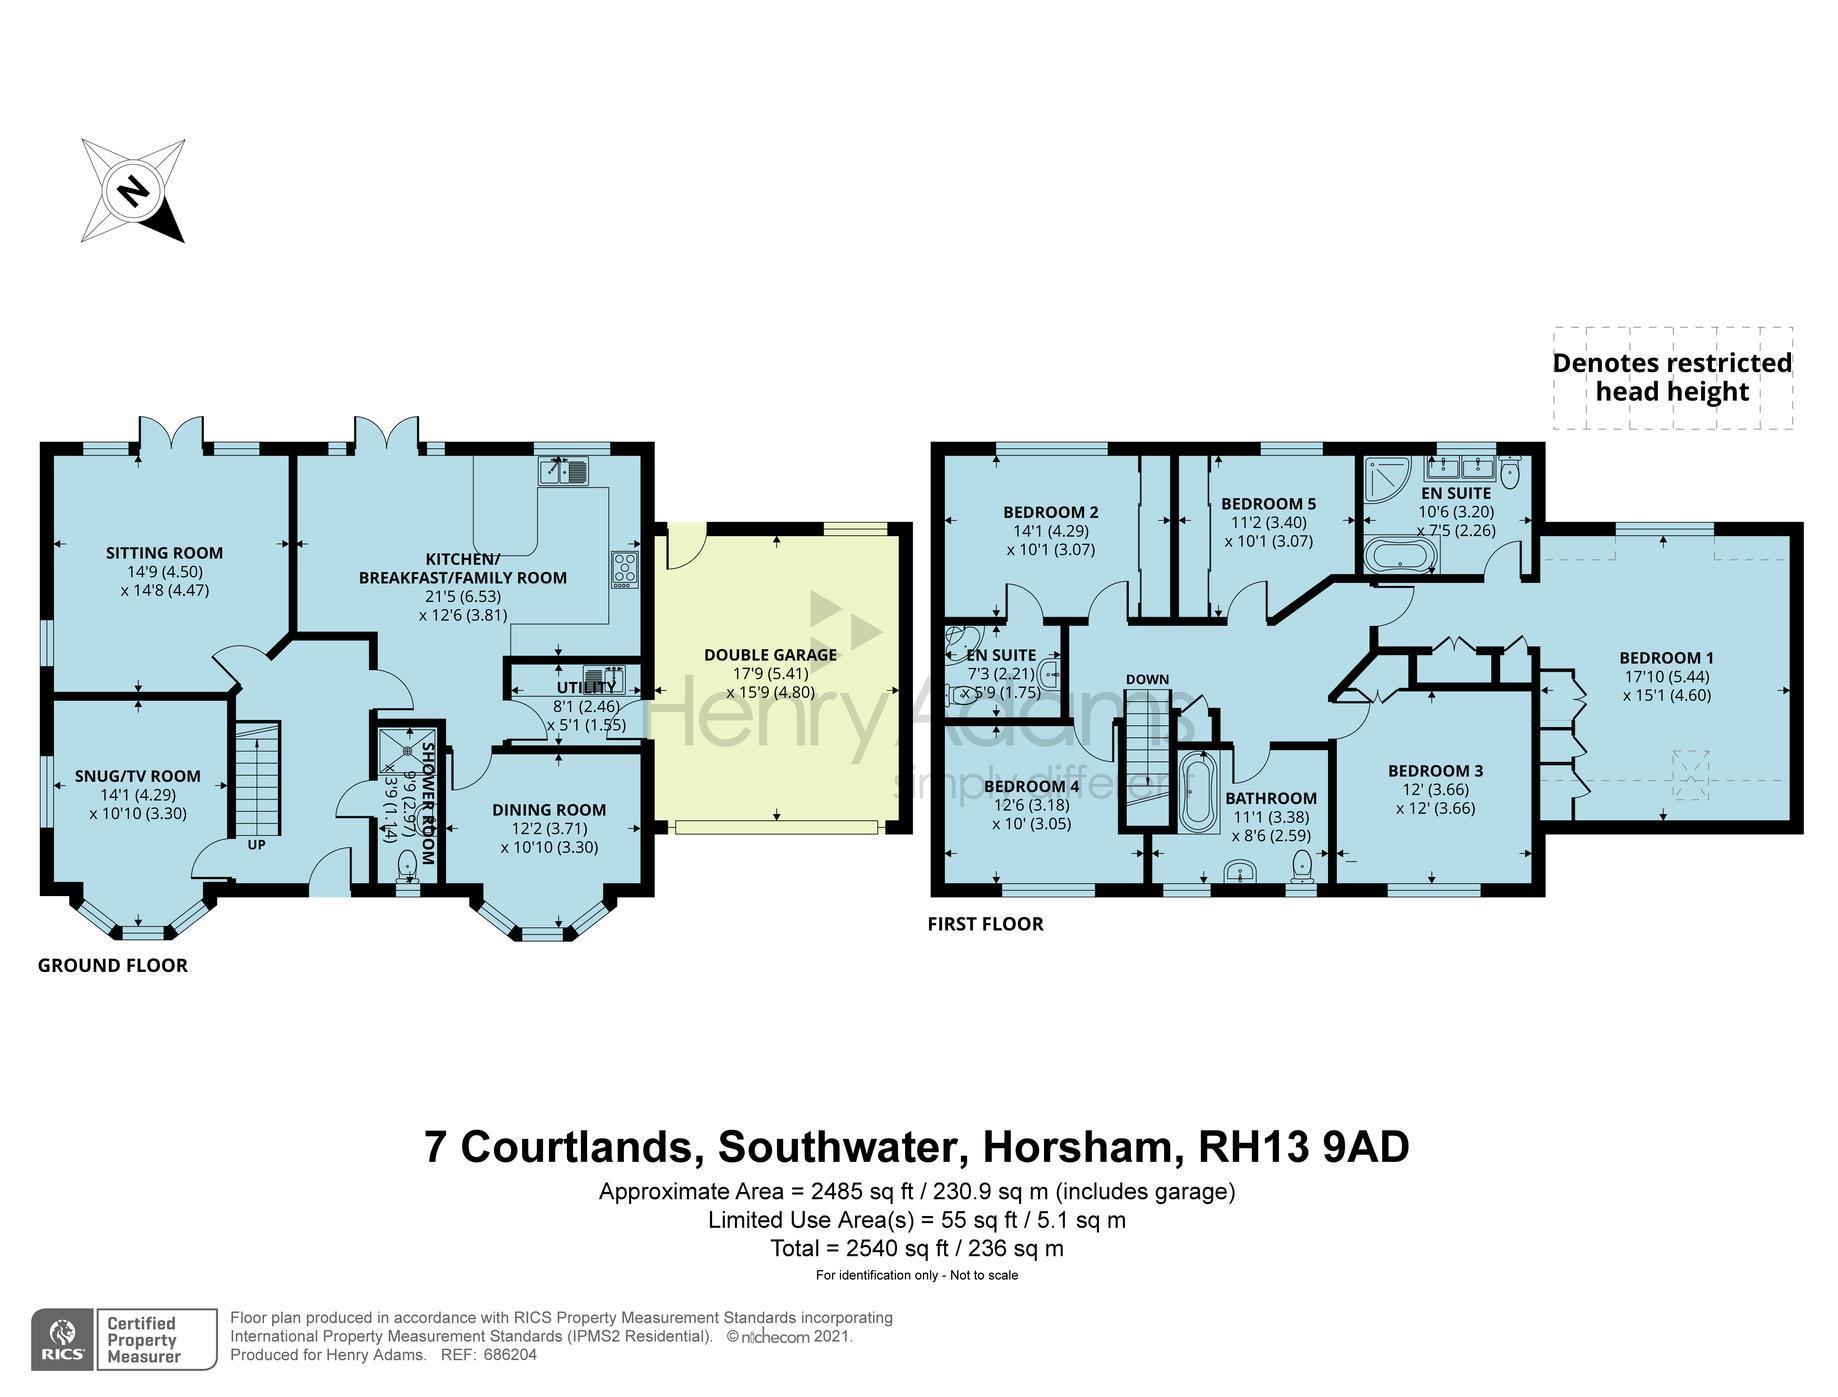 Courtlands, Southwater, Horsham, RH13 floorplans